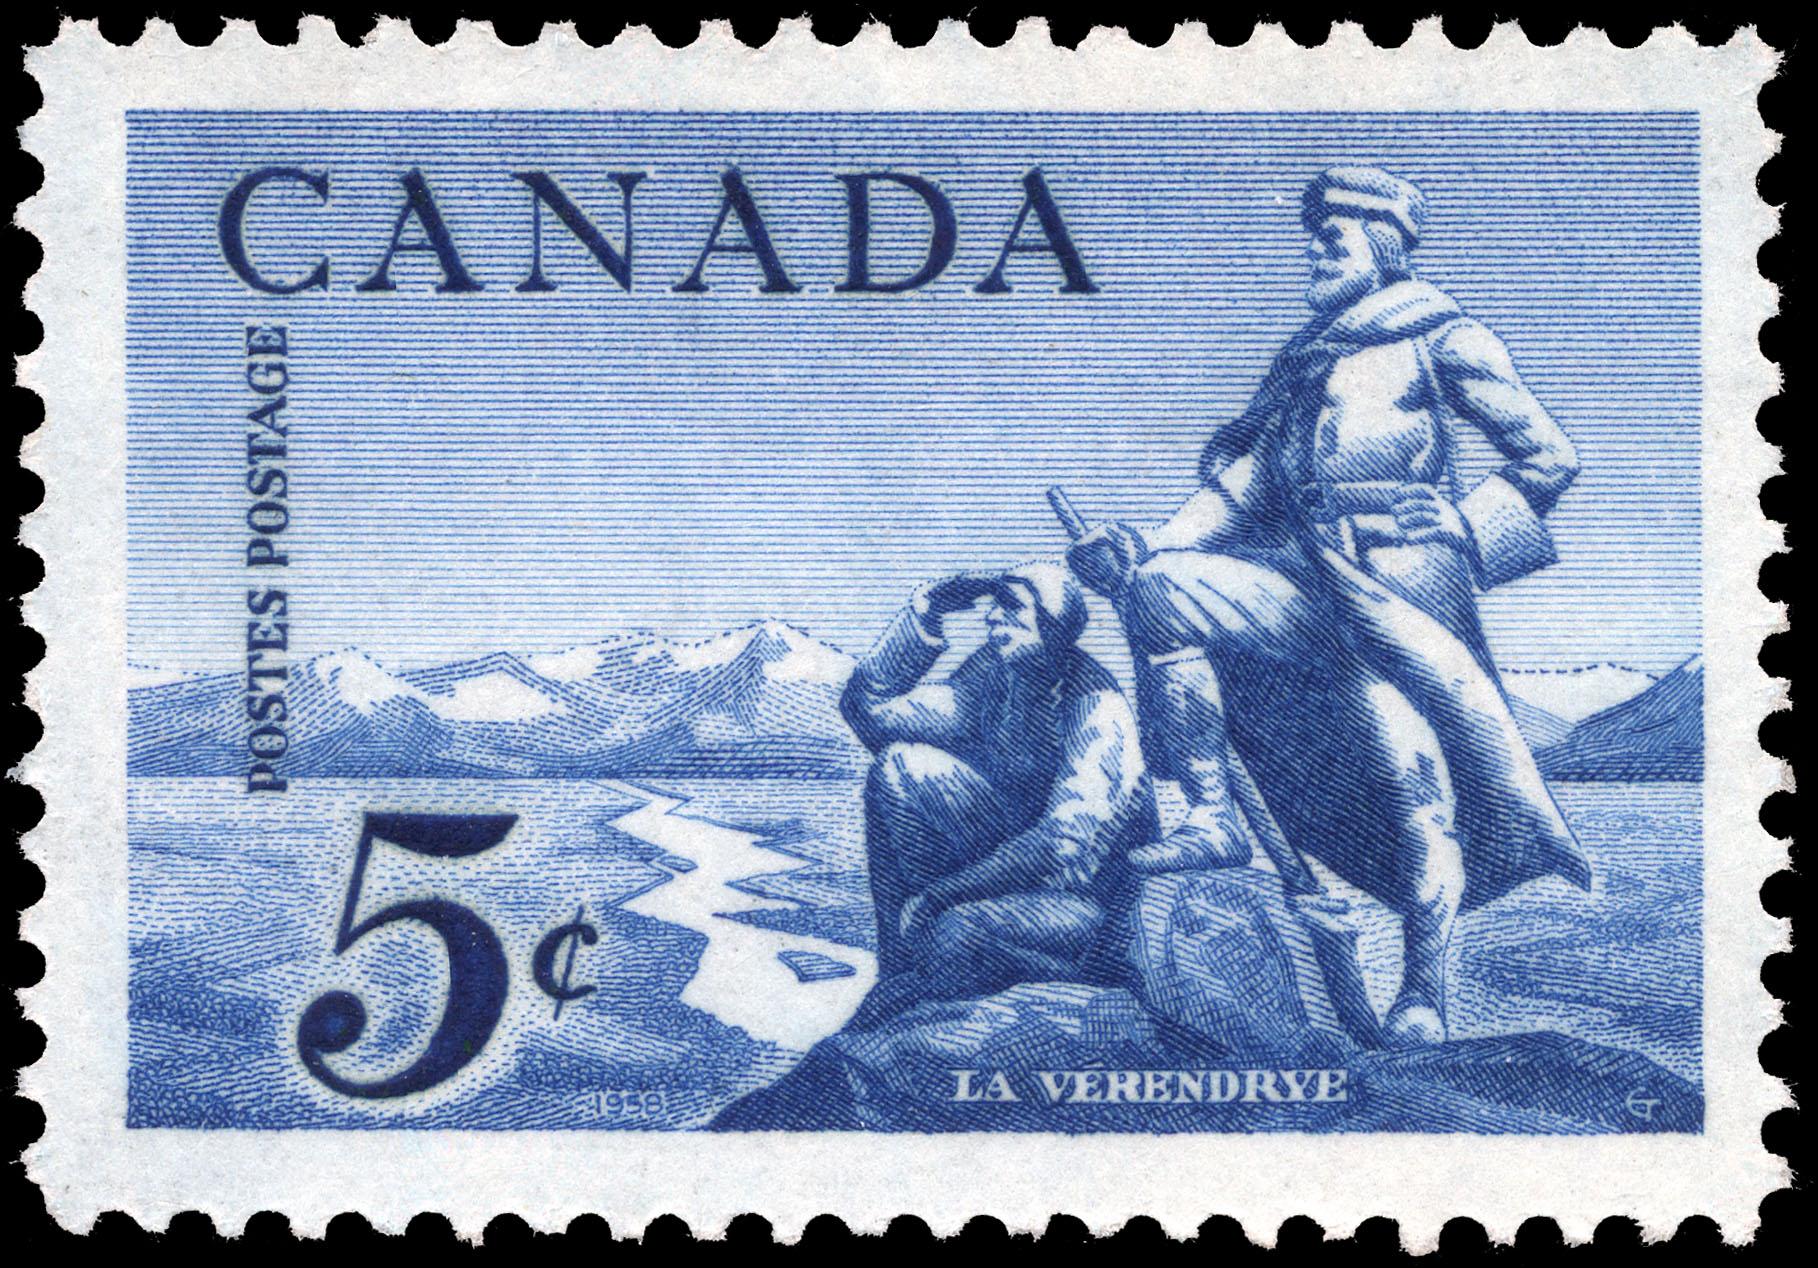 La Verendrye Canada Postage Stamp